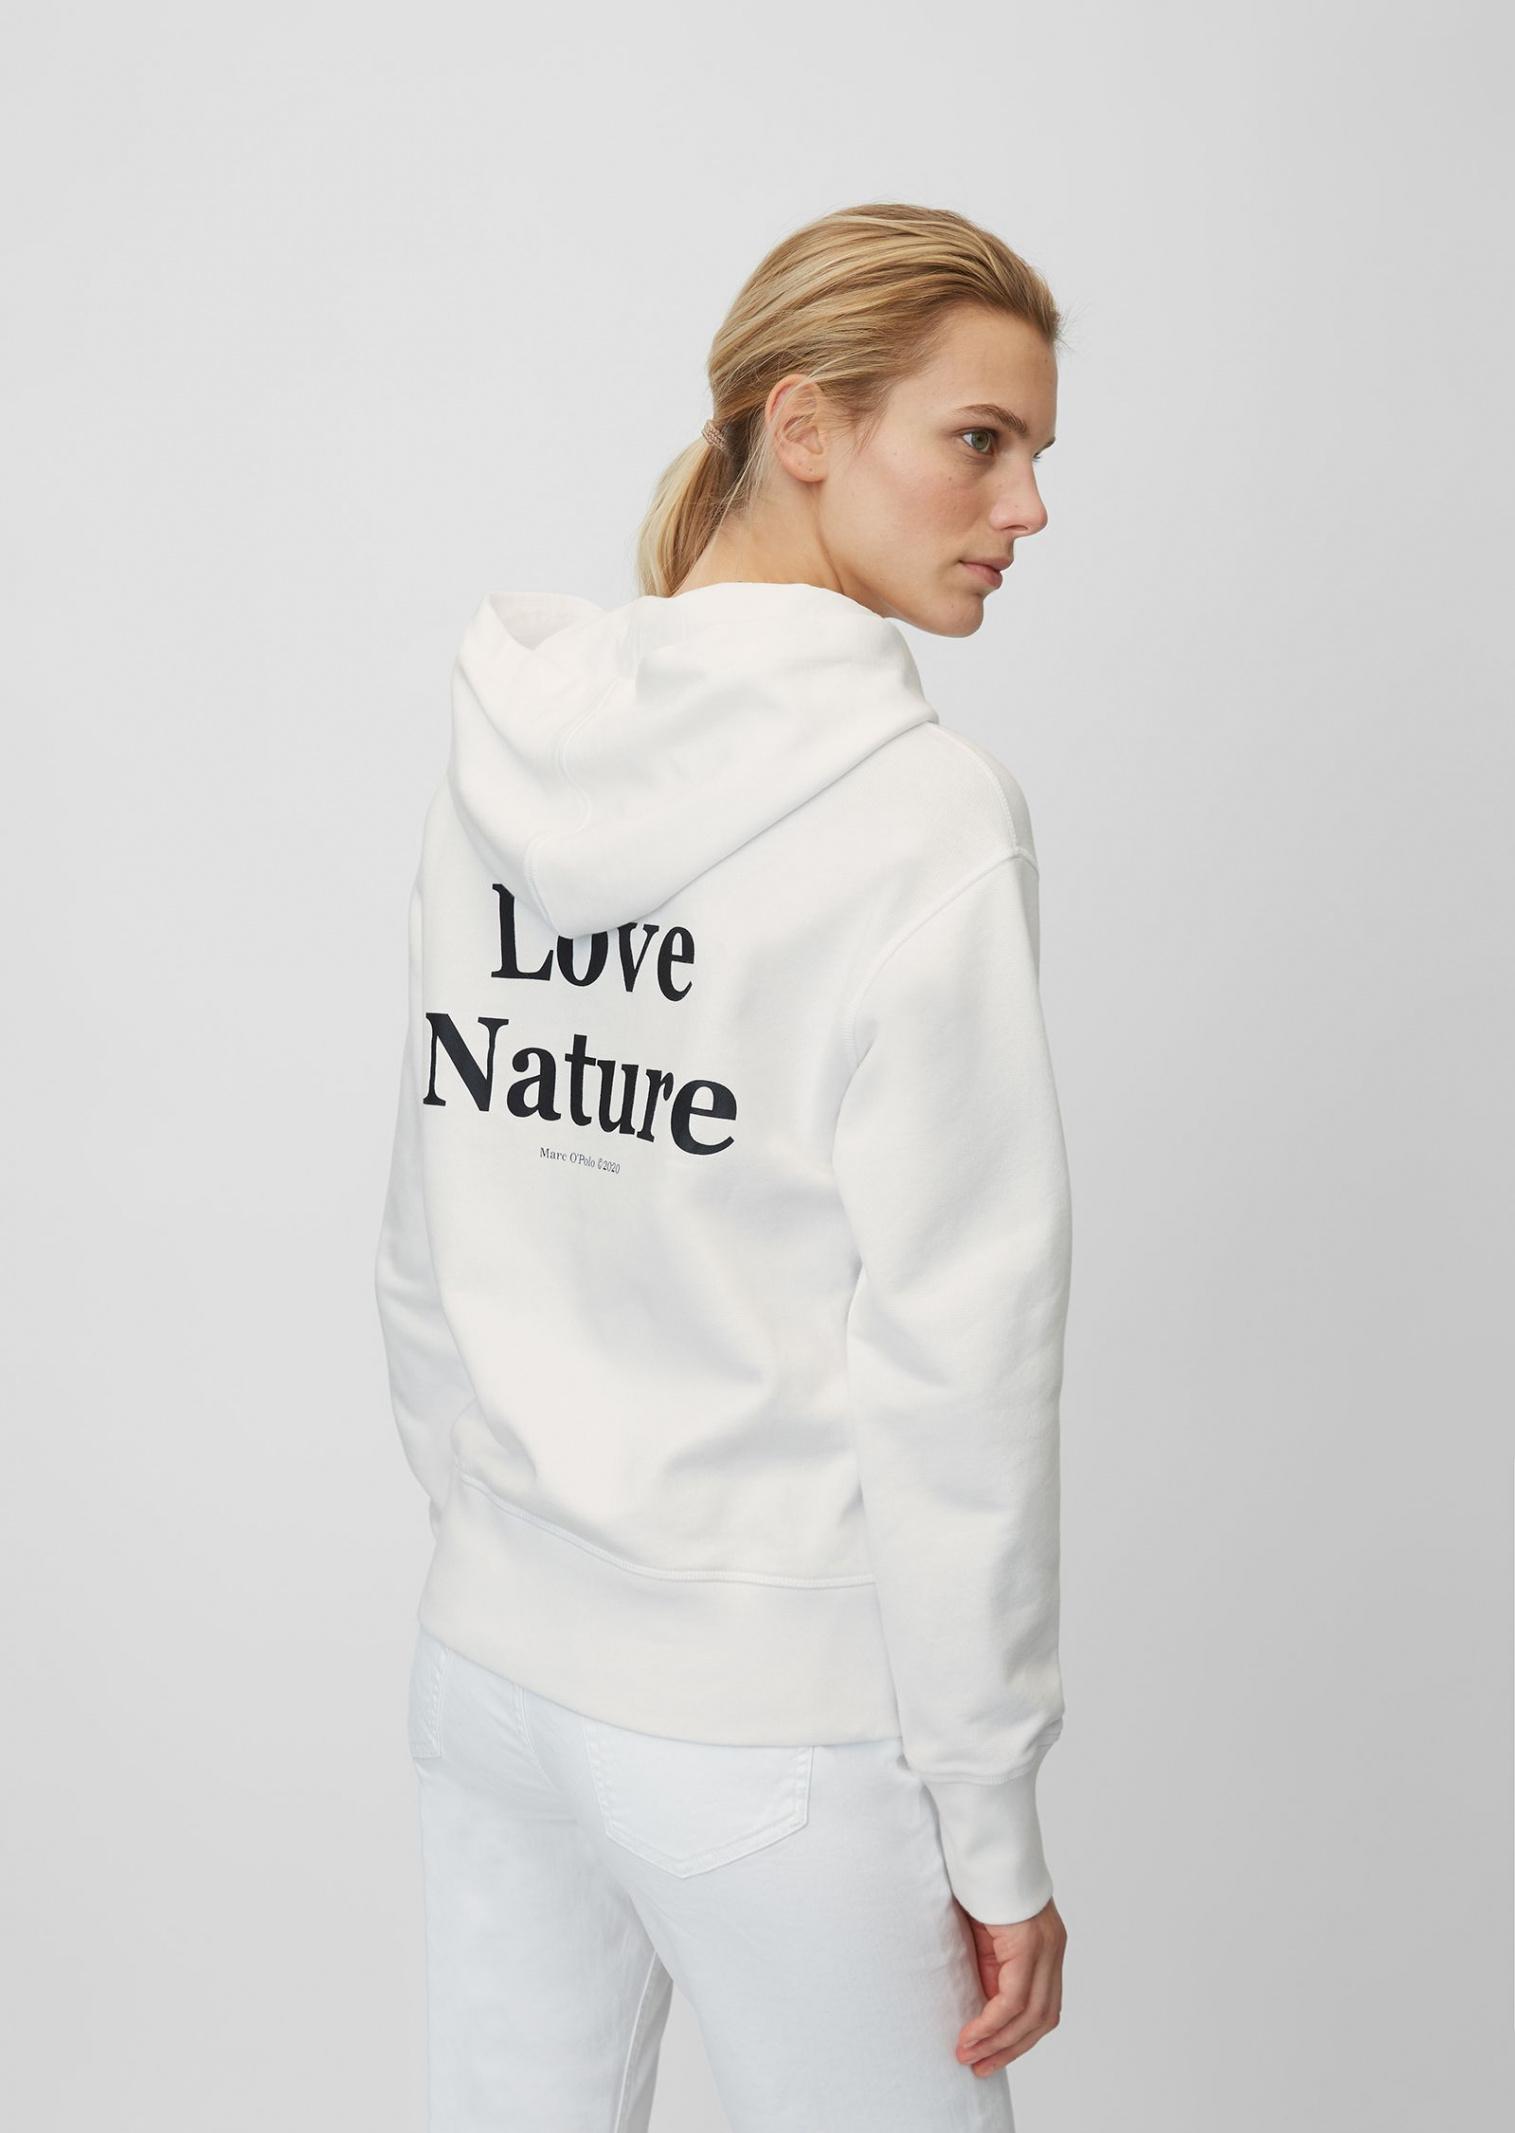 Кофты и свитера женские MARC O'POLO модель PF4004 , 2017